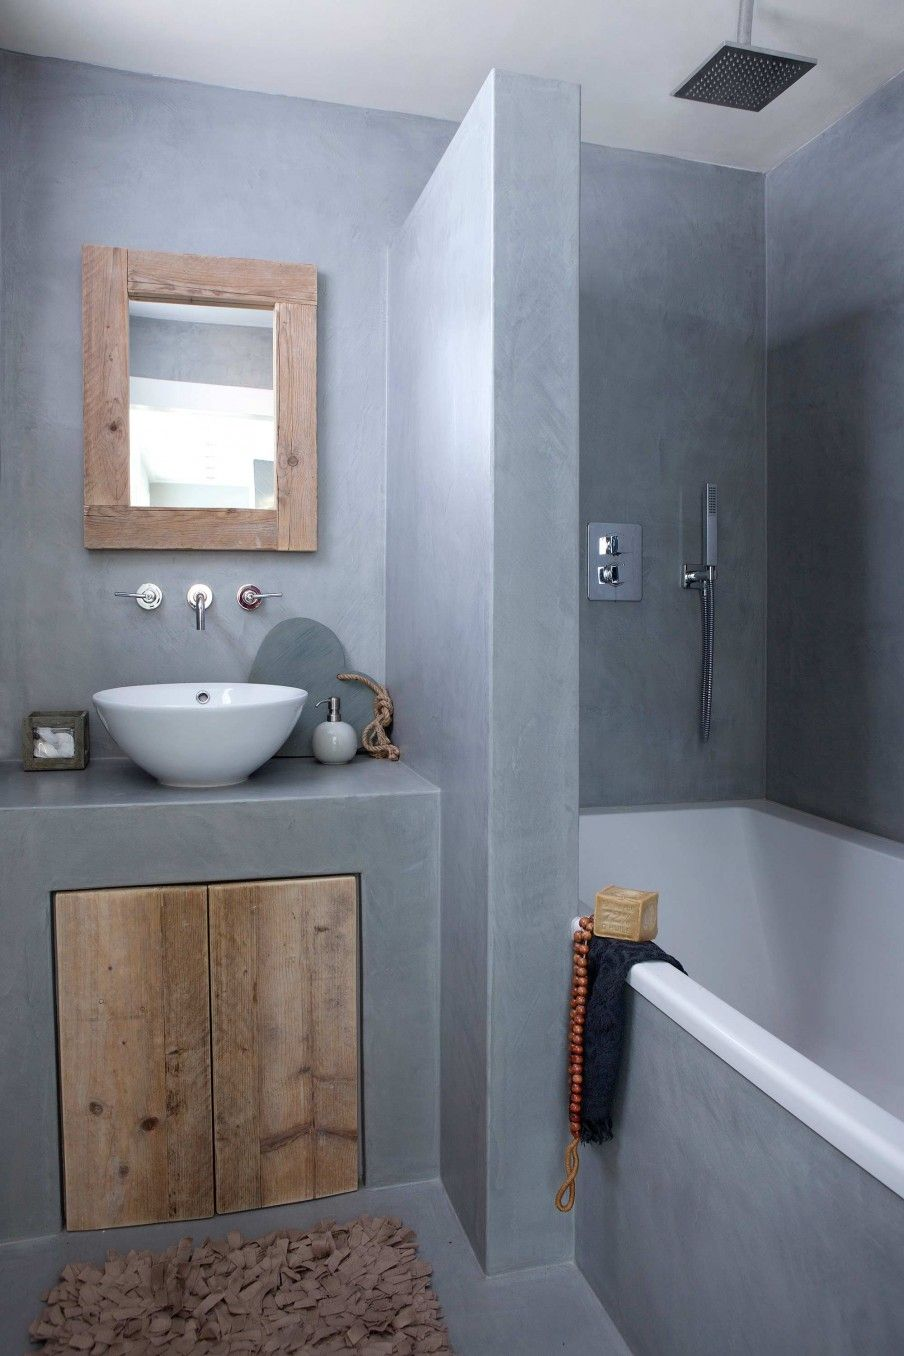 8-tadelakt-badkamer | badkamer | Pinterest | Gäste wc, Diele und ...